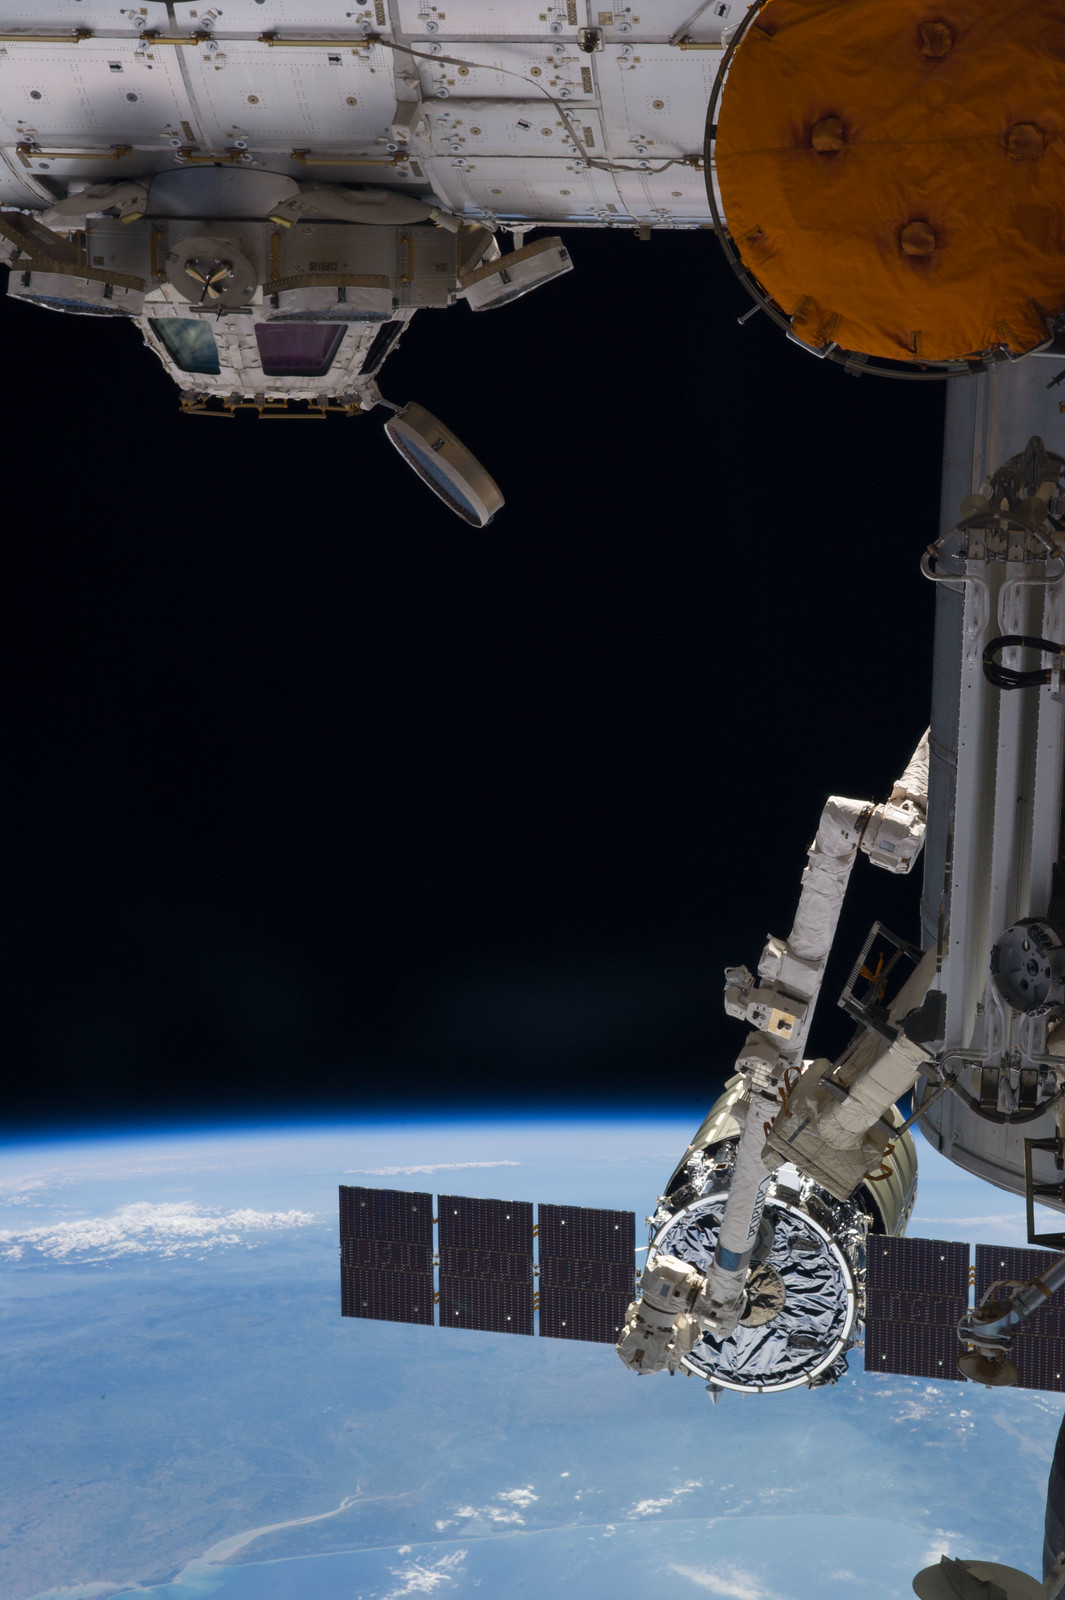 nasa orbital program - 736×1105